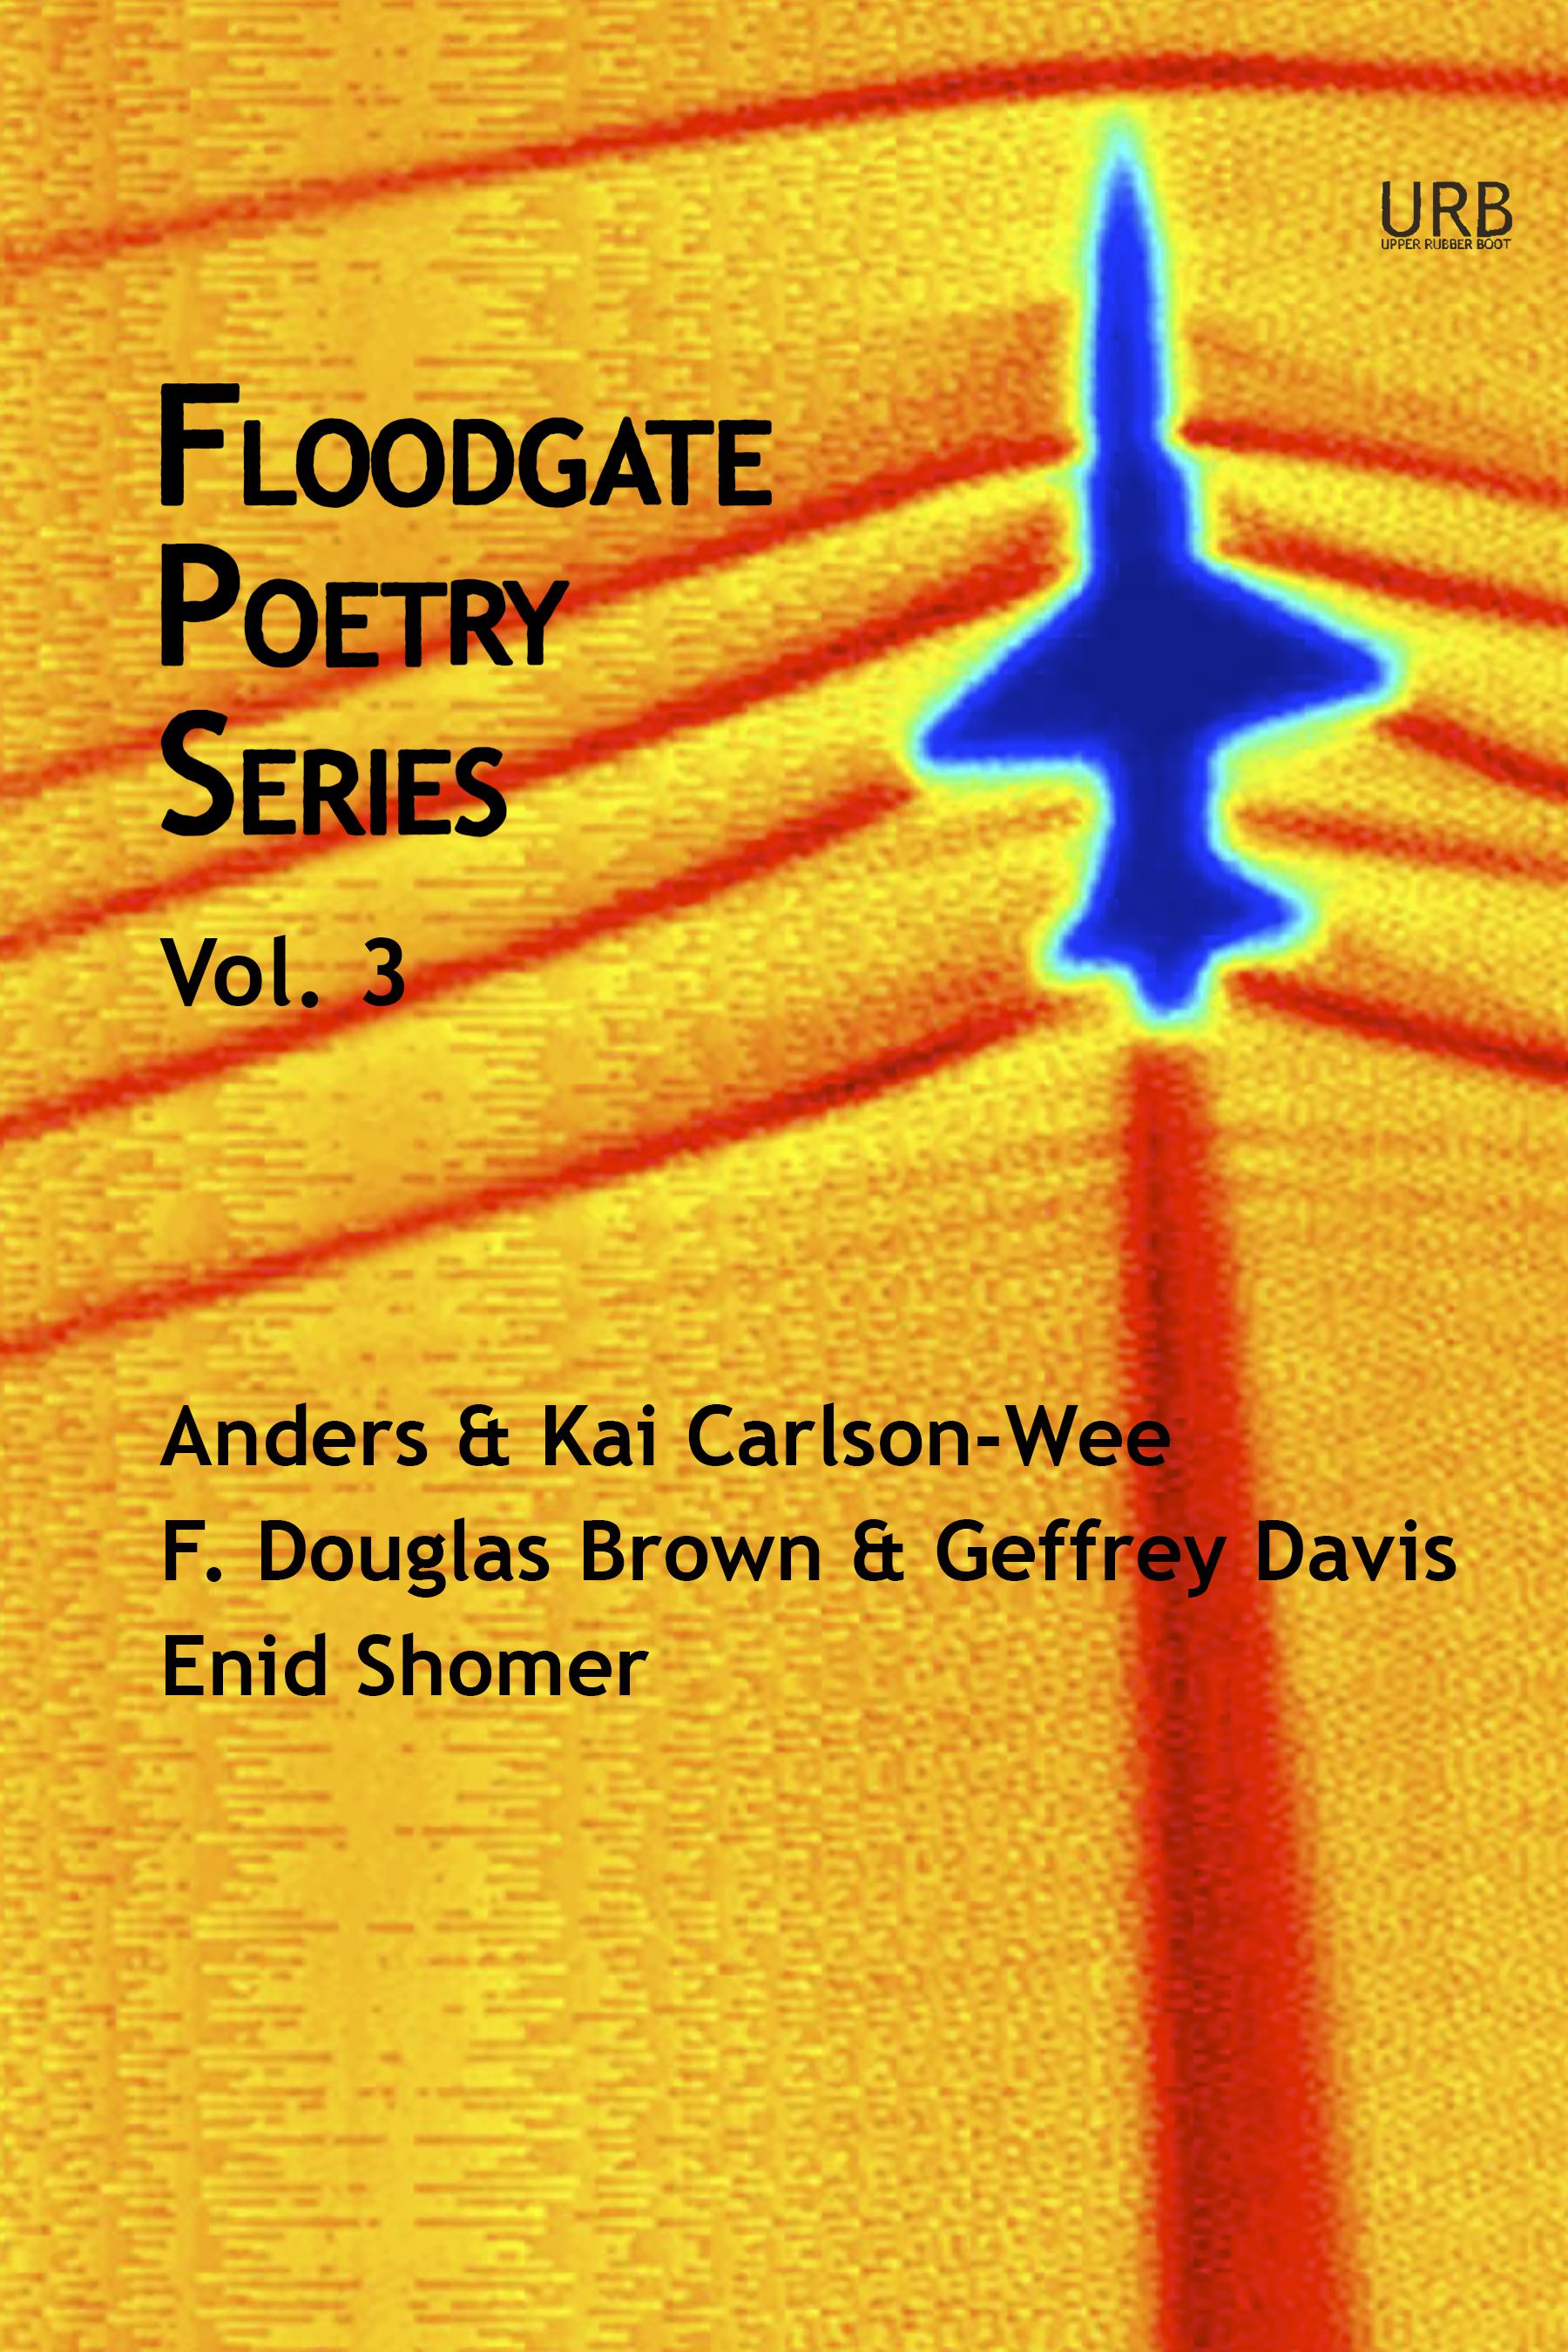 floodgate3-printcover.jpg